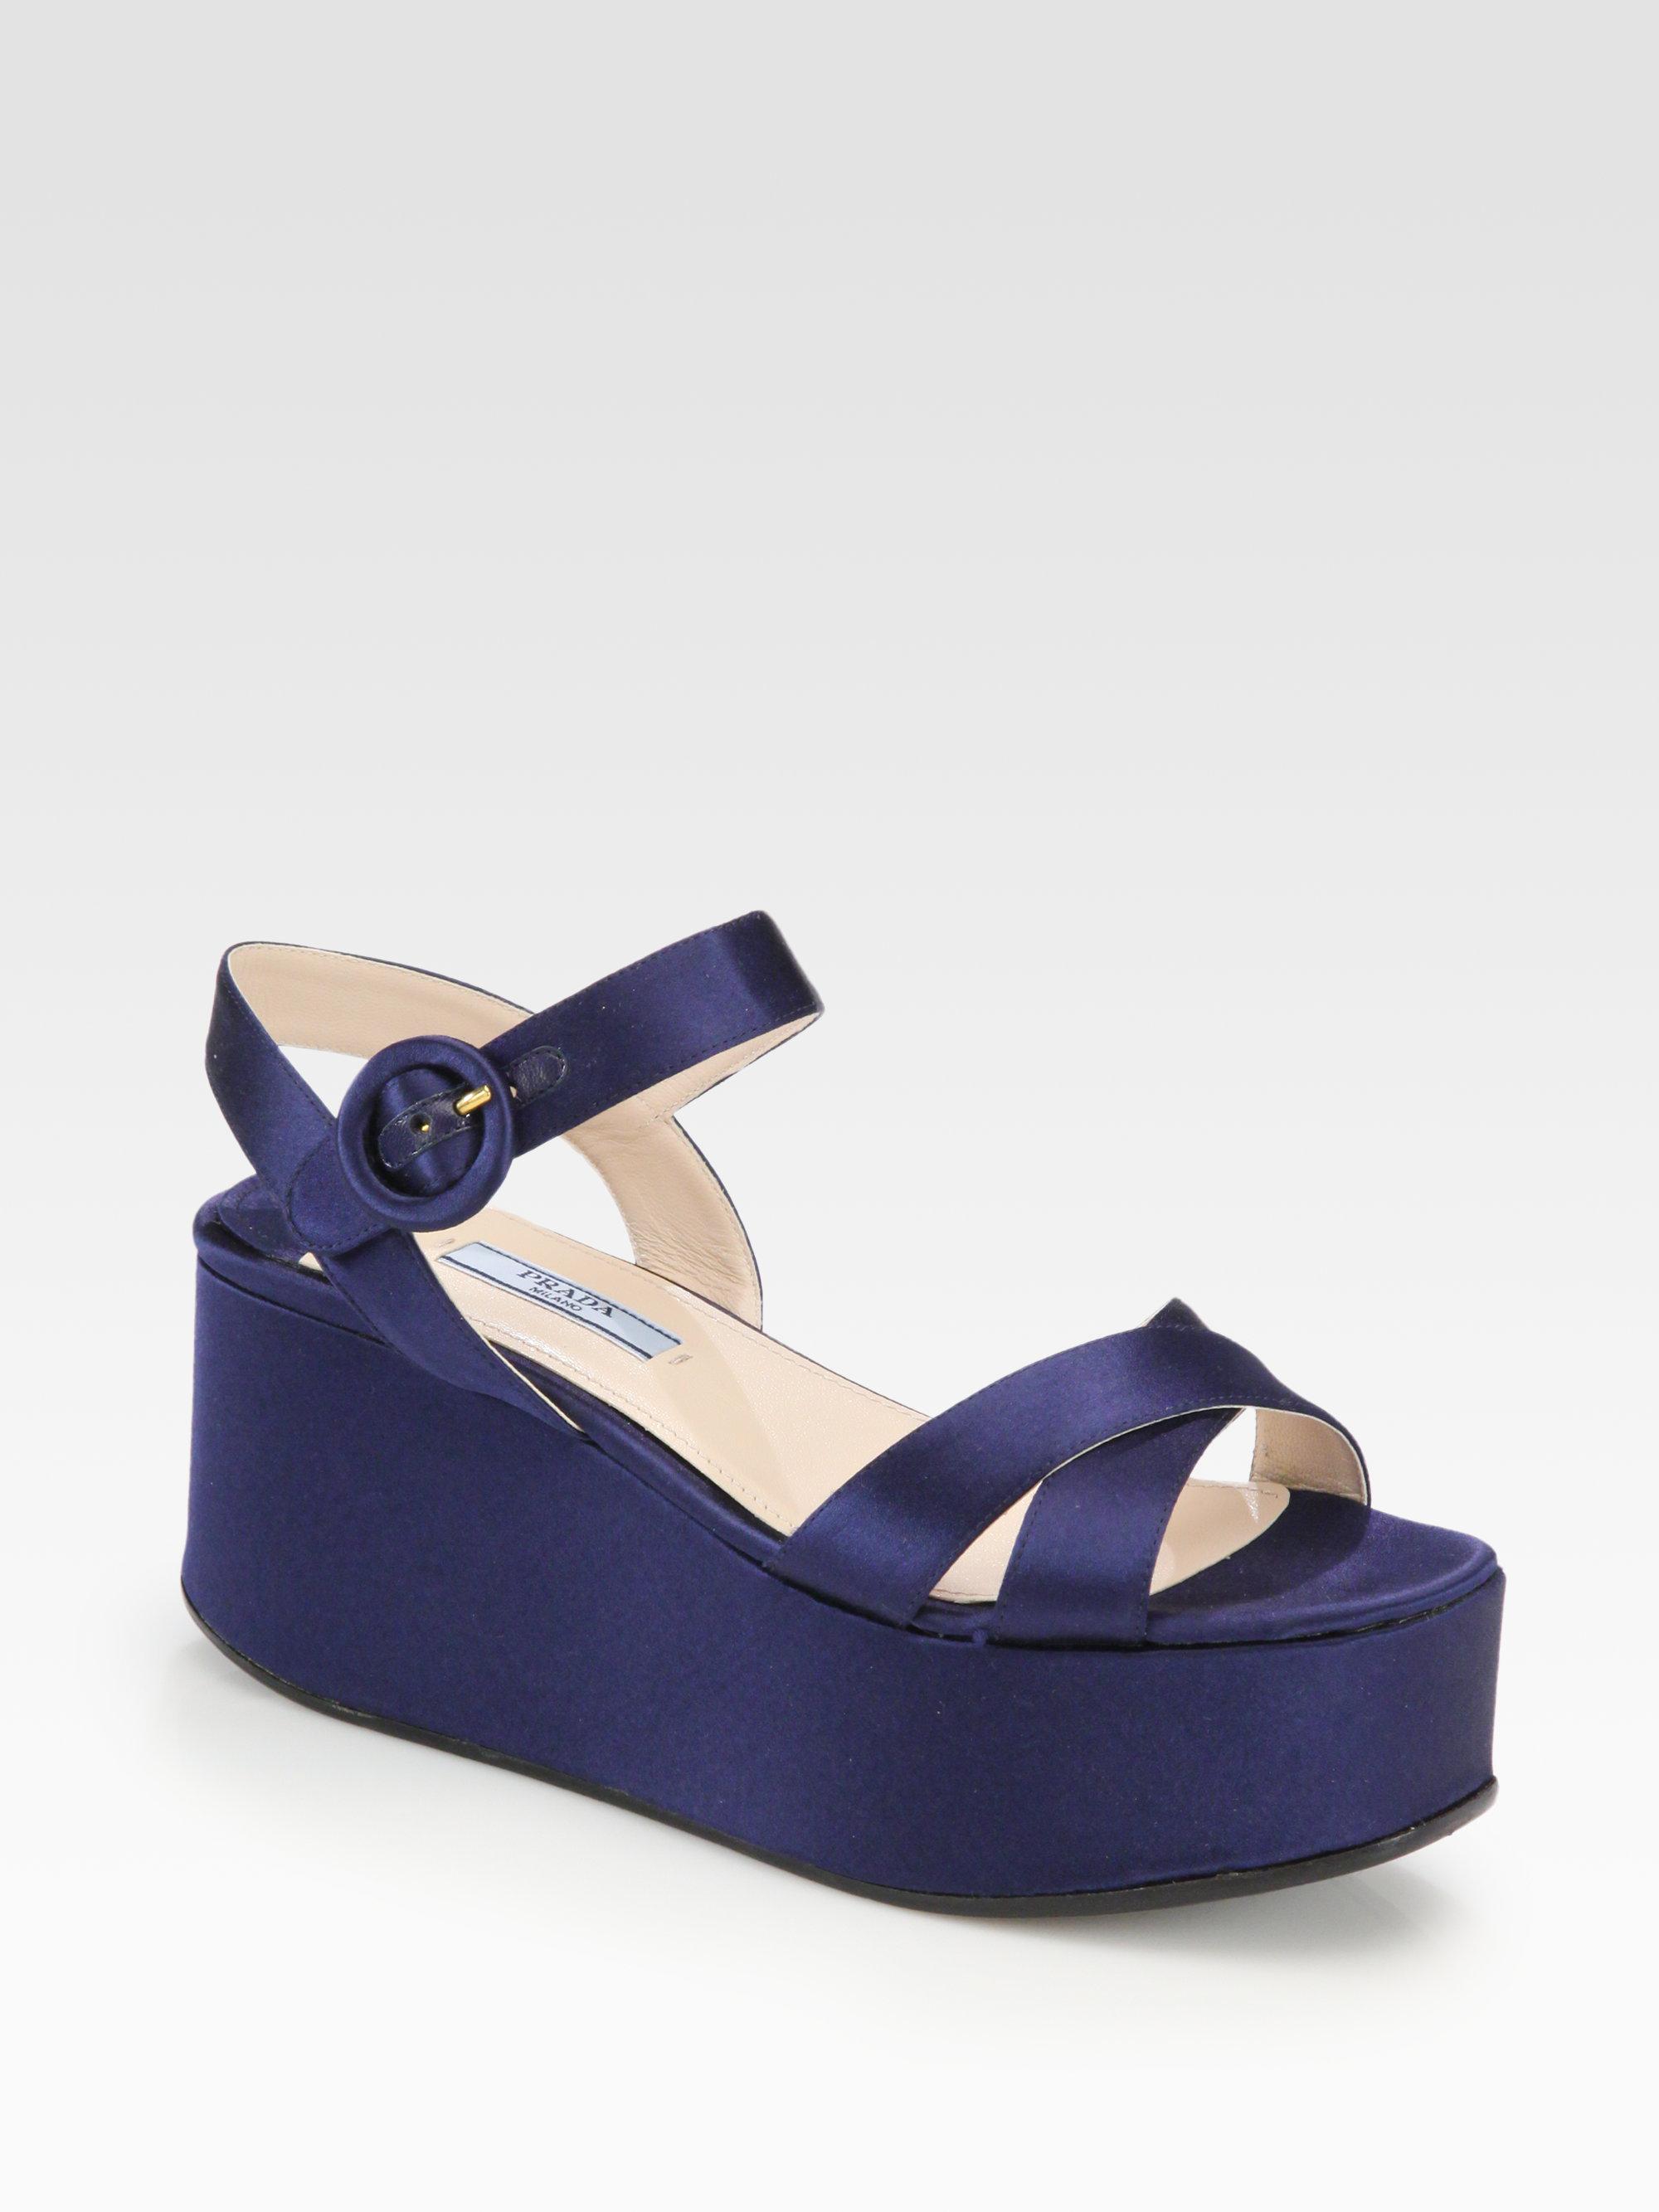 a8d784ce4cb Lyst - Prada Satin Platform Wedge Sandals in Blue